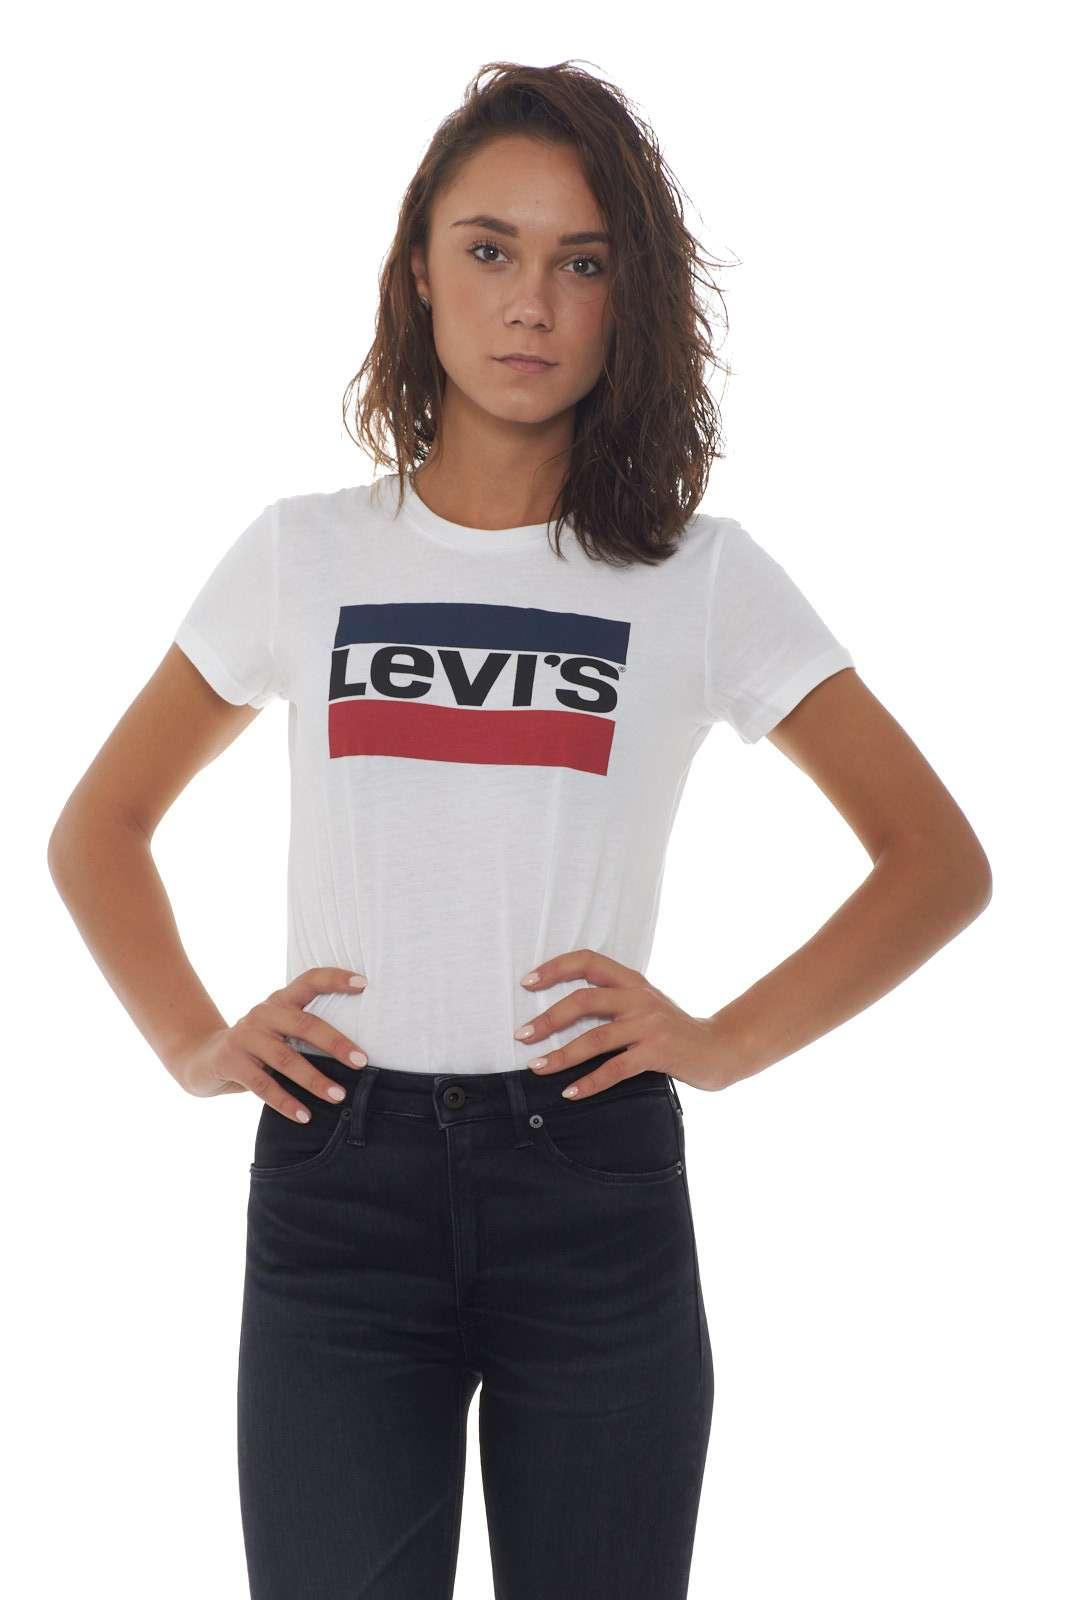 https://www.parmax.com/media/catalog/product/a/i/AI-outlet_parmax-t-shirt-donna-Levis-17369%200297-A.jpg